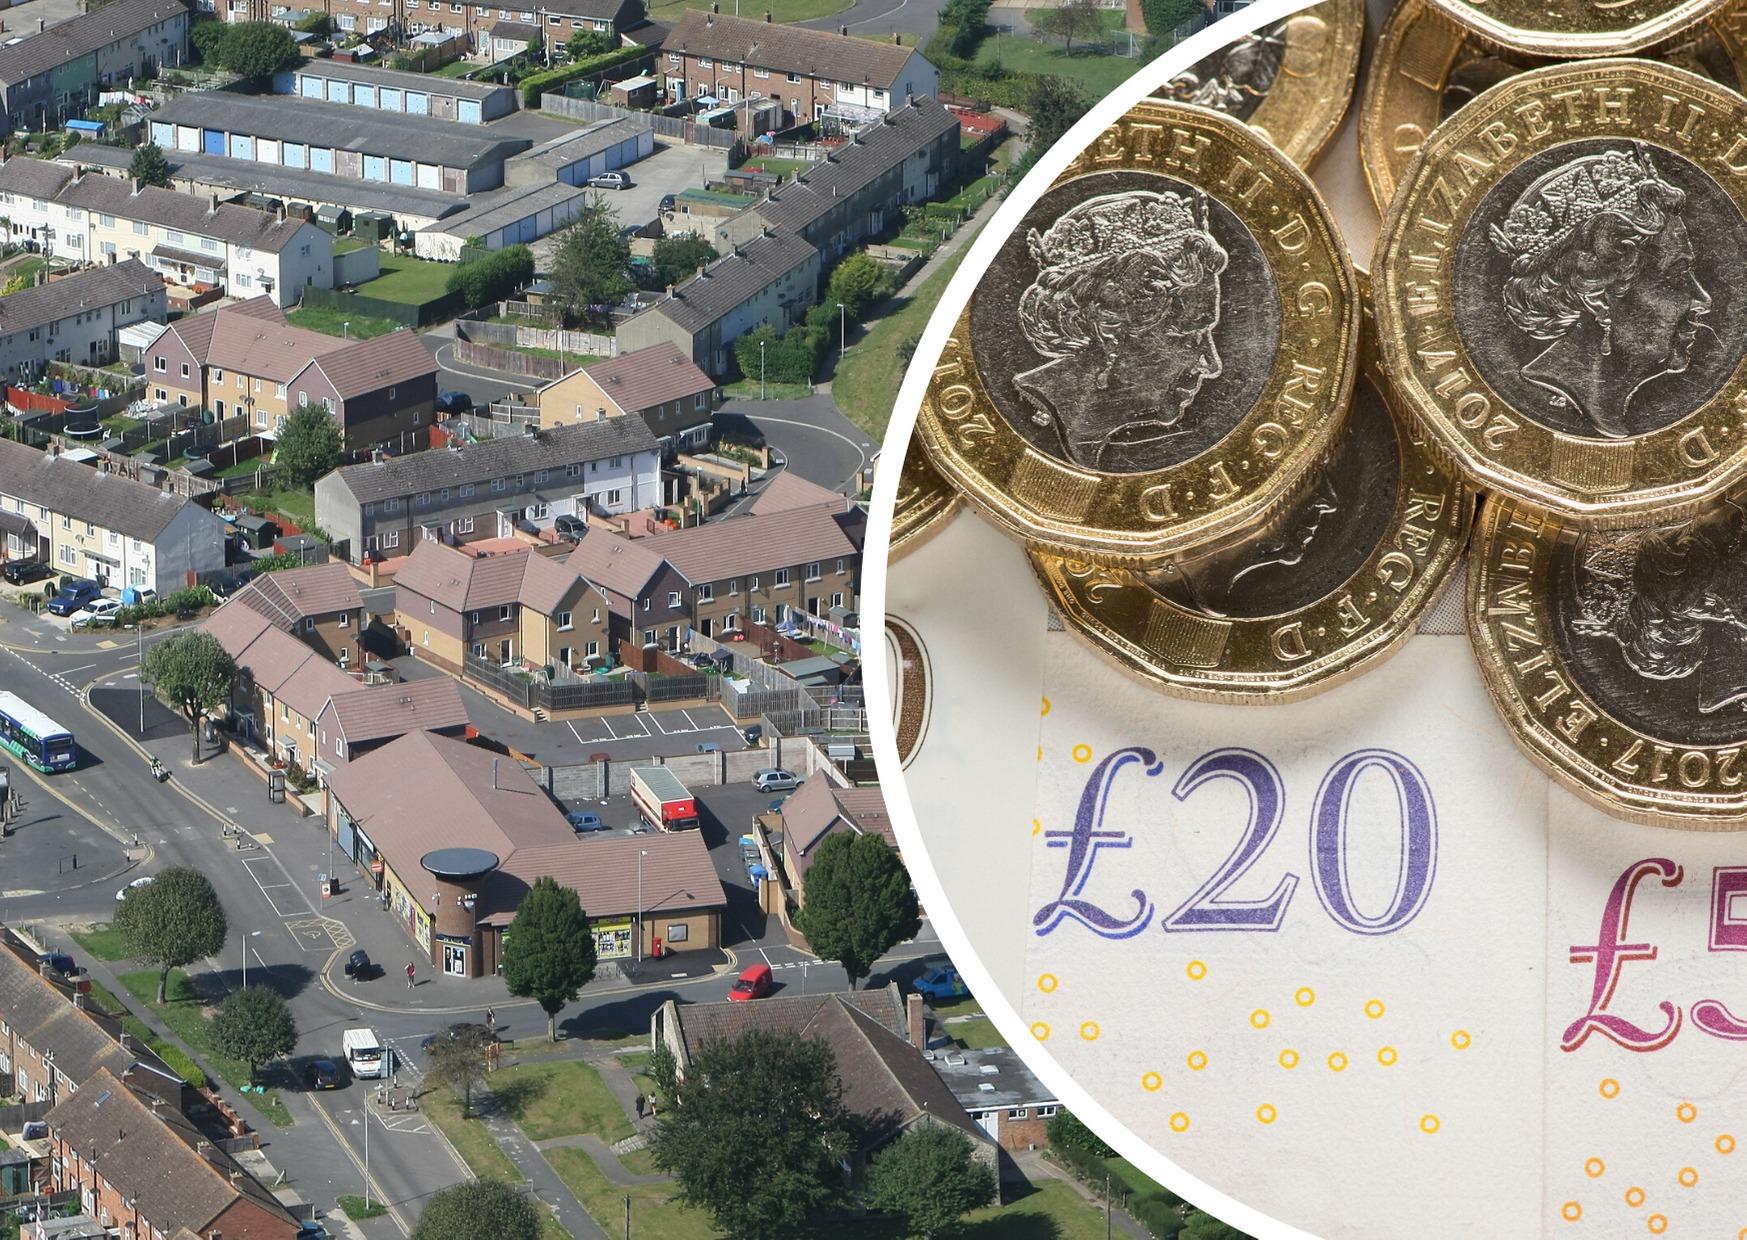 Rent cuts leave £20 million hole in Swindon council's housing maintenance budget